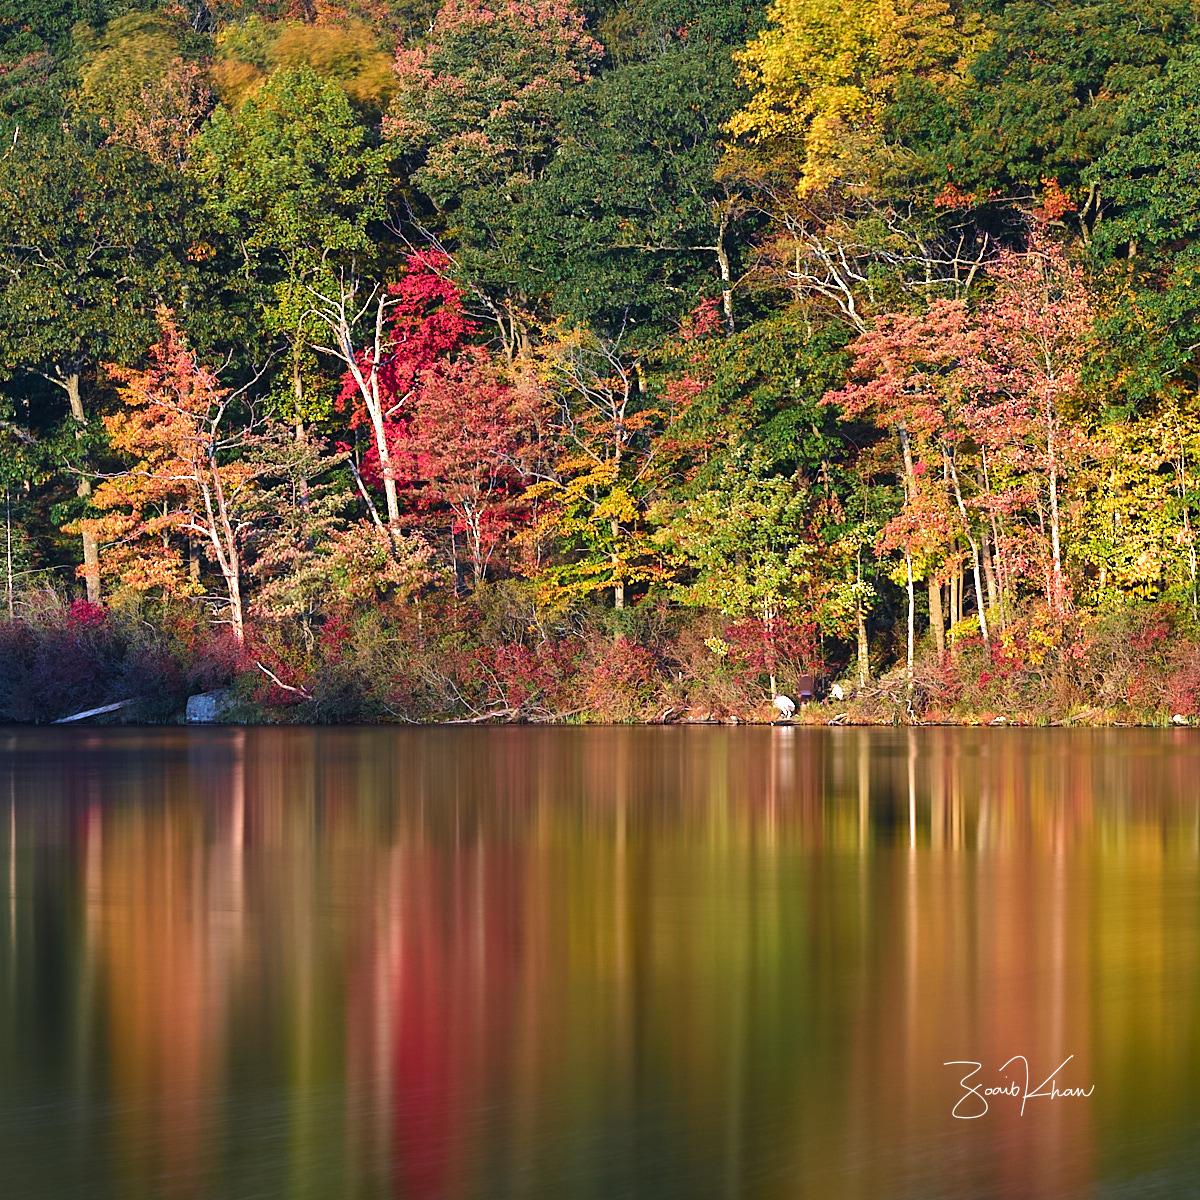 Harriman State Park, NY, USA